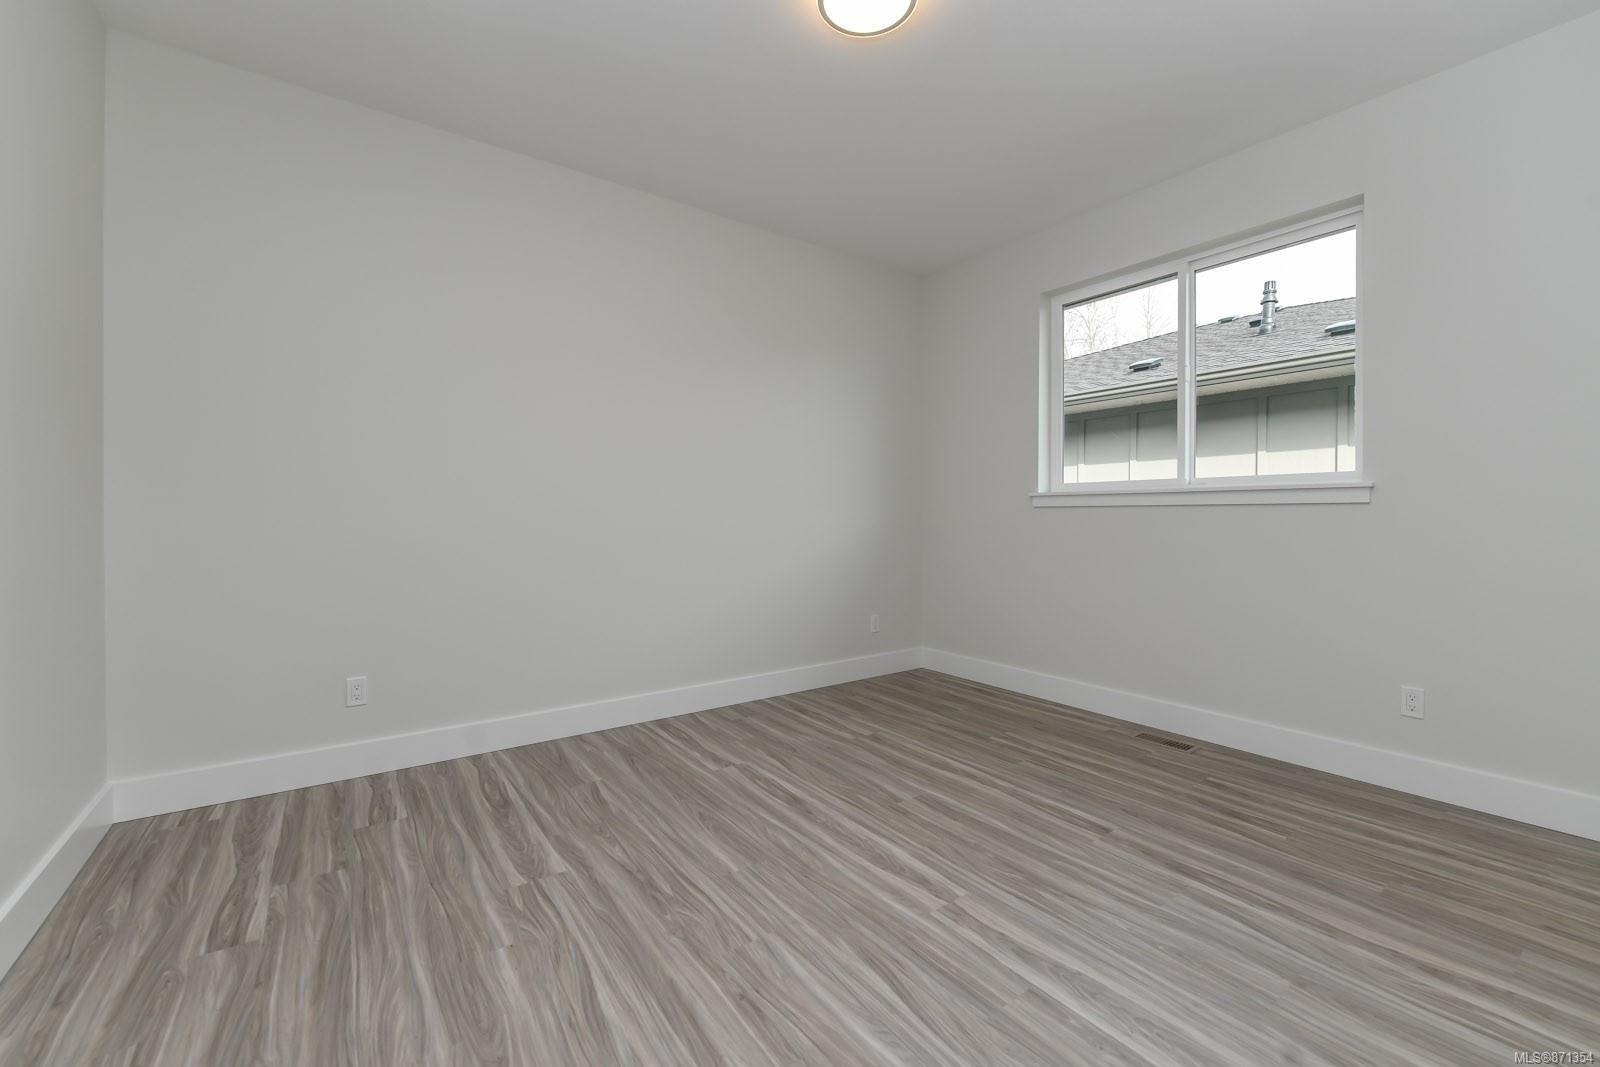 Photo 17: Photos: 68 Grayhawk Pl in : CV Courtenay City House for sale (Comox Valley)  : MLS®# 871354